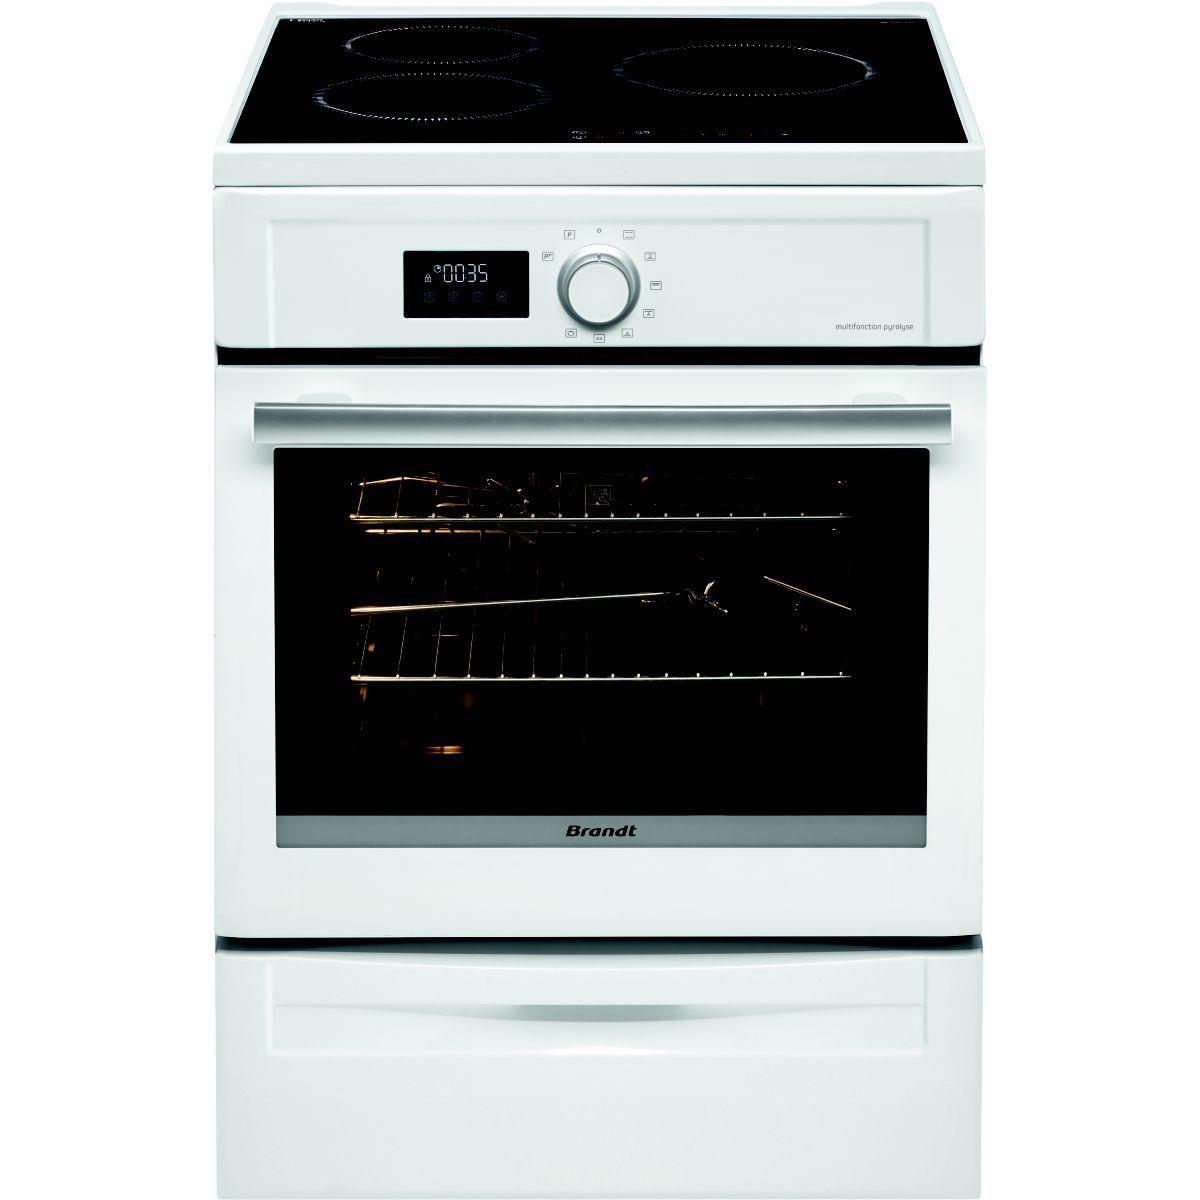 Cuisini�re induction brandt bci6600w (photo)